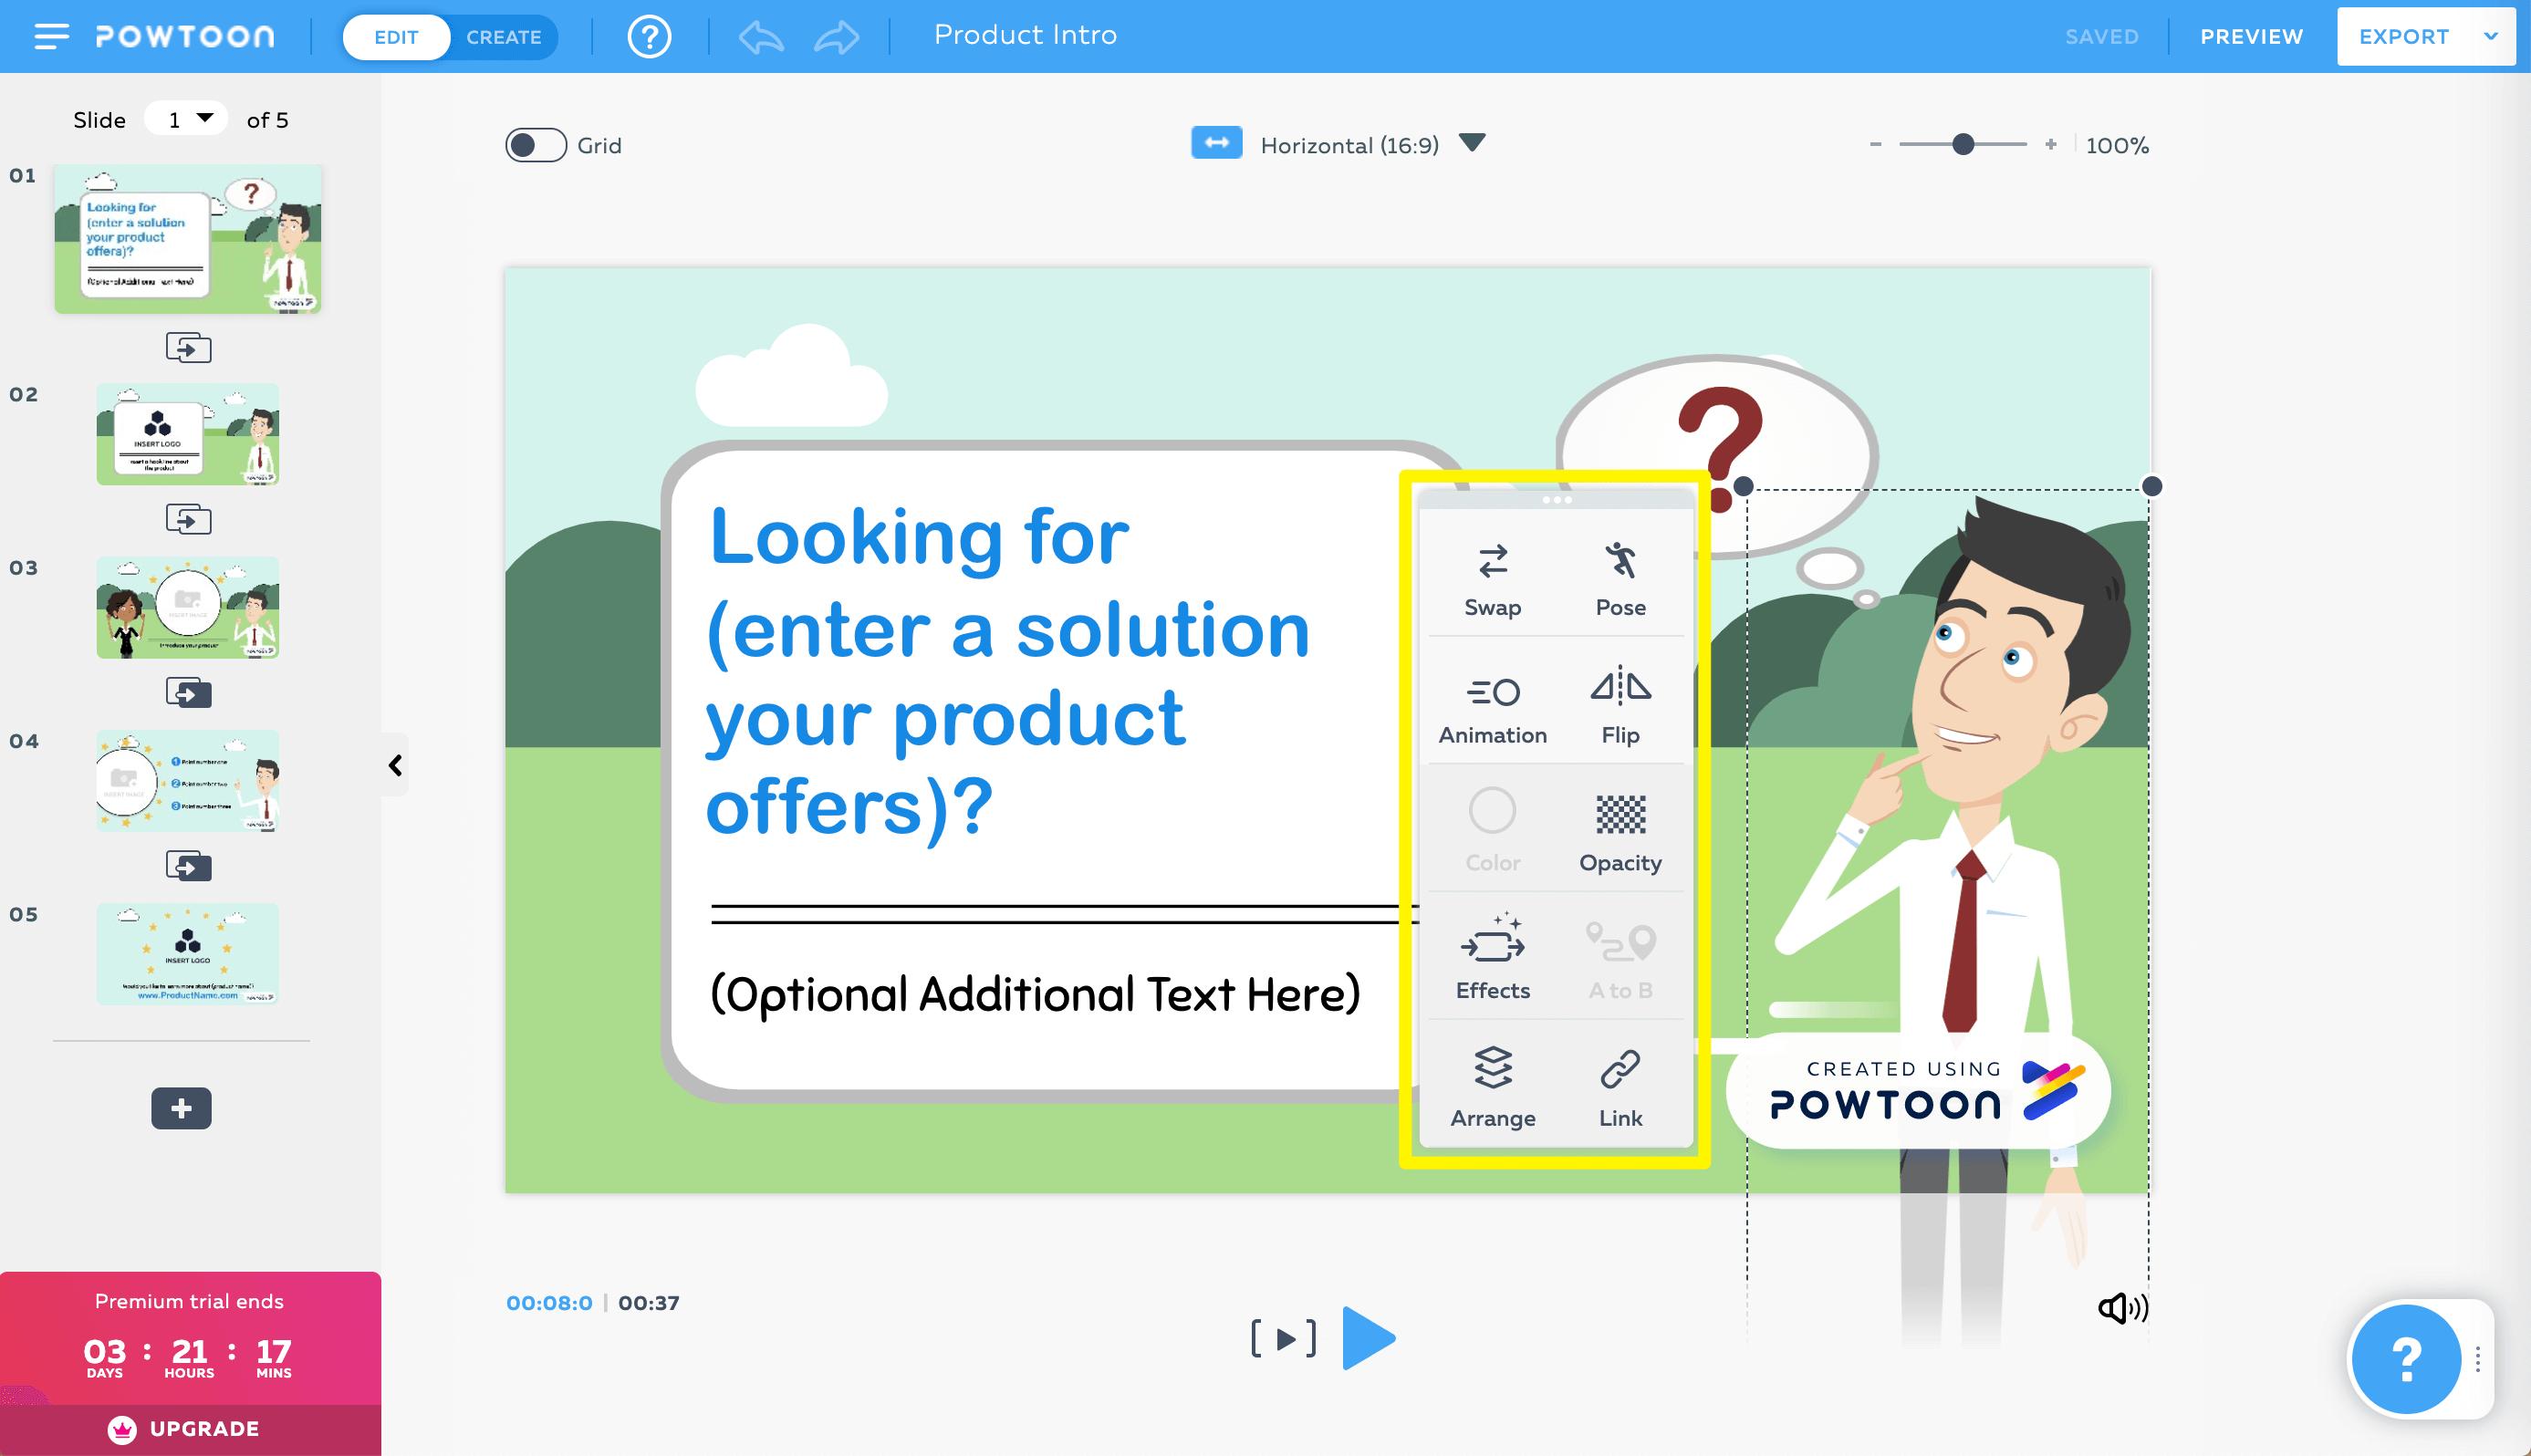 The Powtoon character toolbar options.